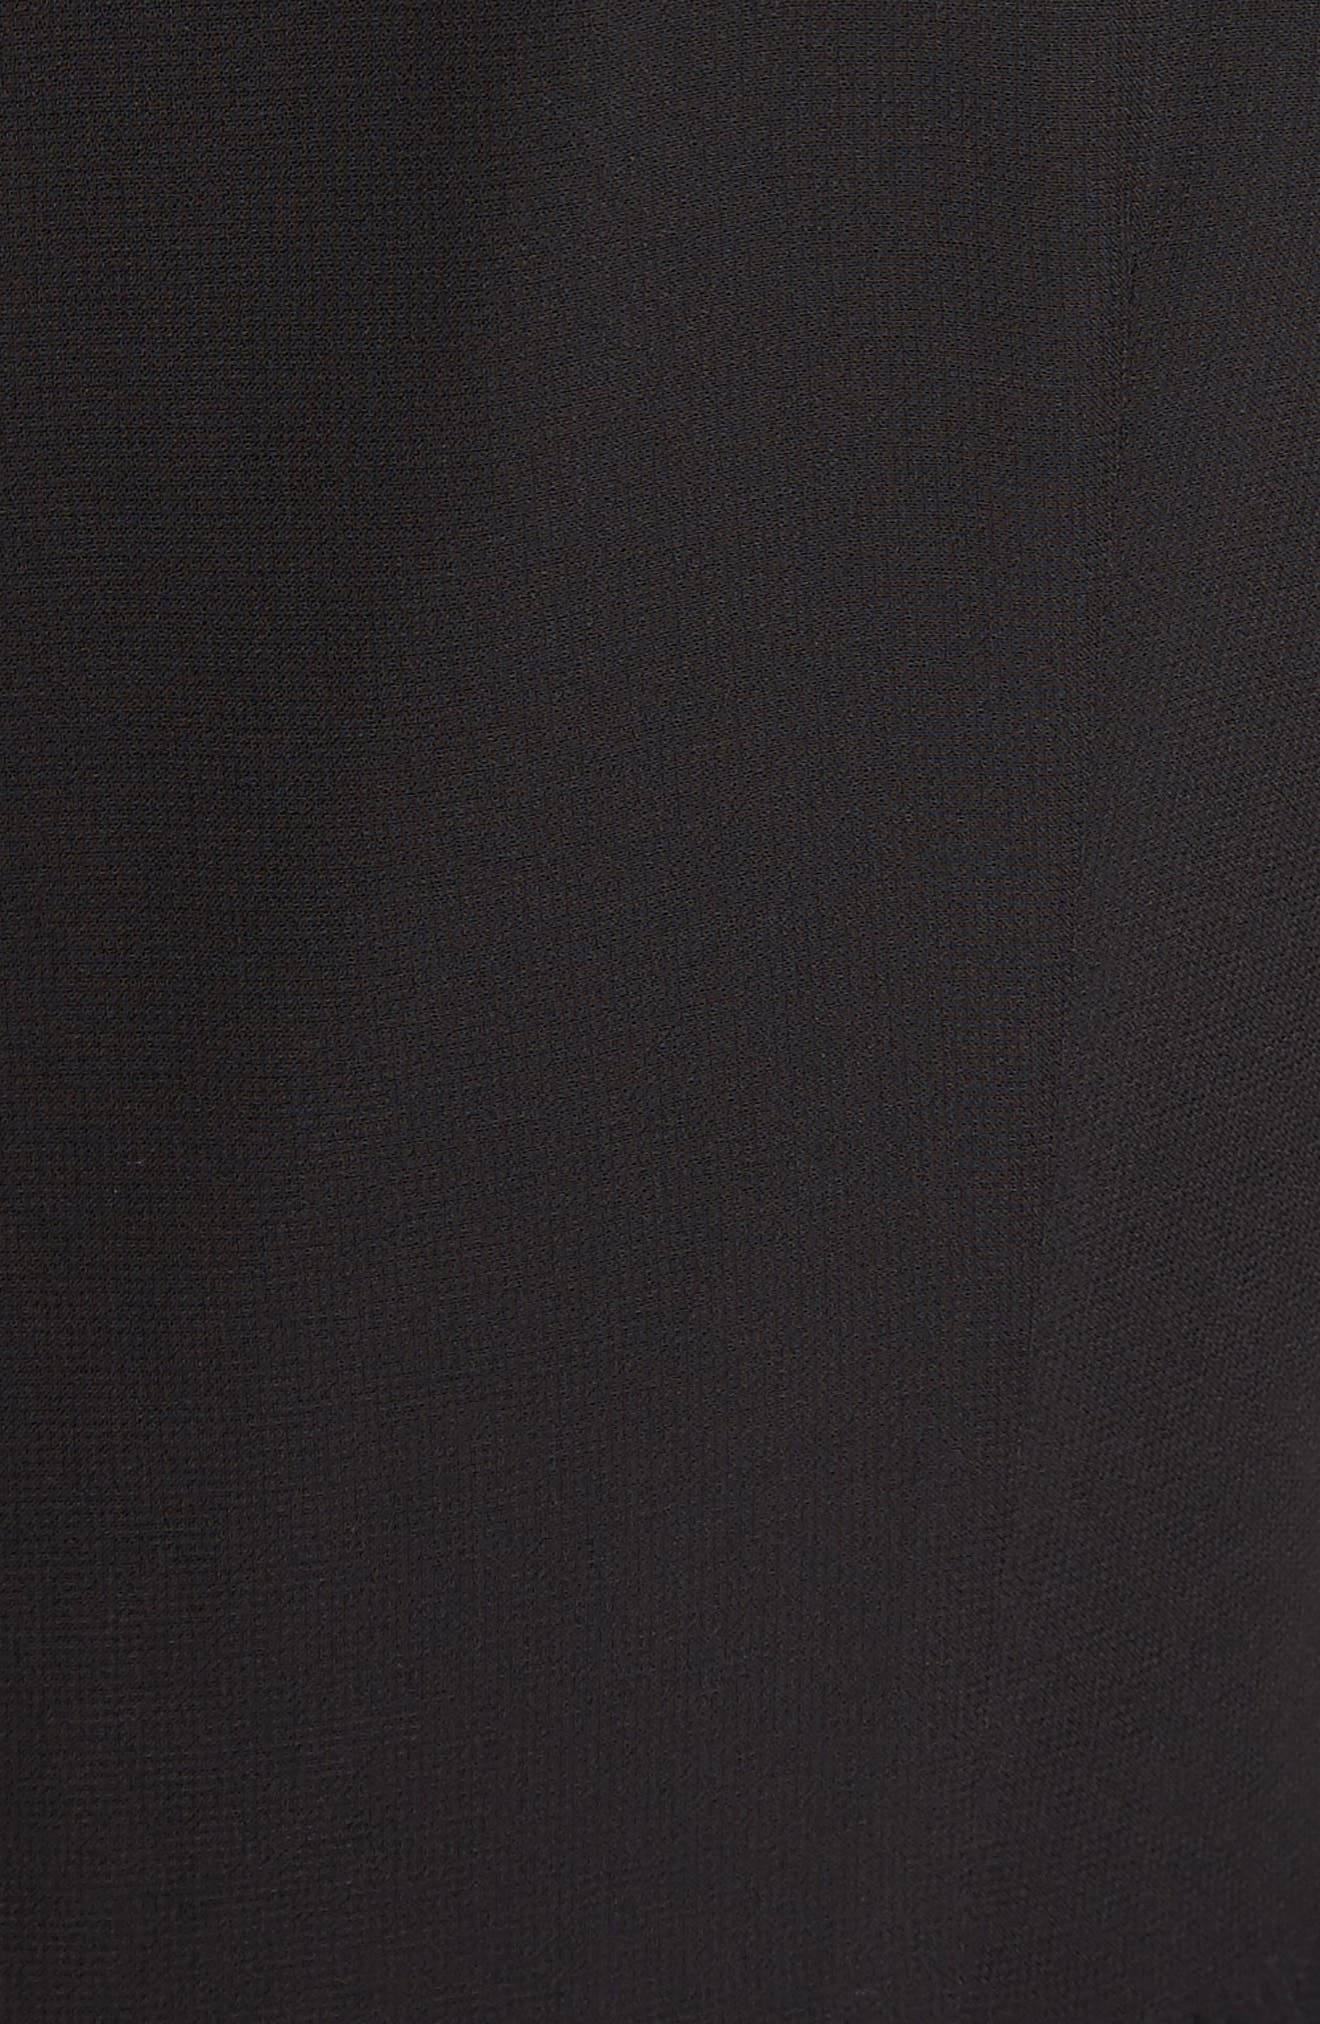 Avianah Lace Trim Fit & Flare Dress,                             Alternate thumbnail 5, color,                             Black